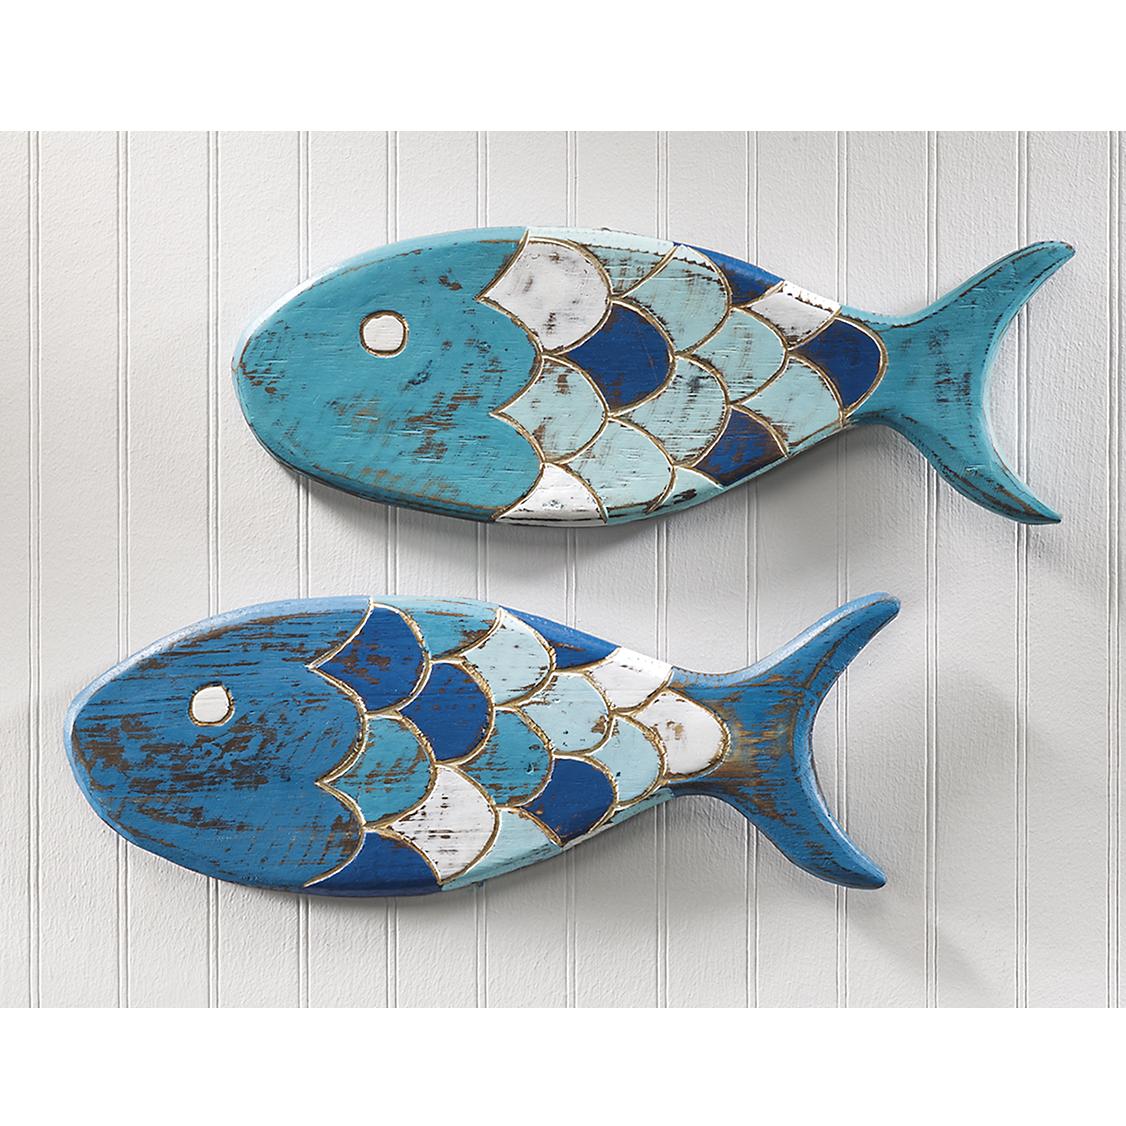 Wooden Fish Plaques Set Of Two Stylish Home Decor Clothing Accessories Jewelry Poisson En Bois Poisson Ceramique Idees De Poterie